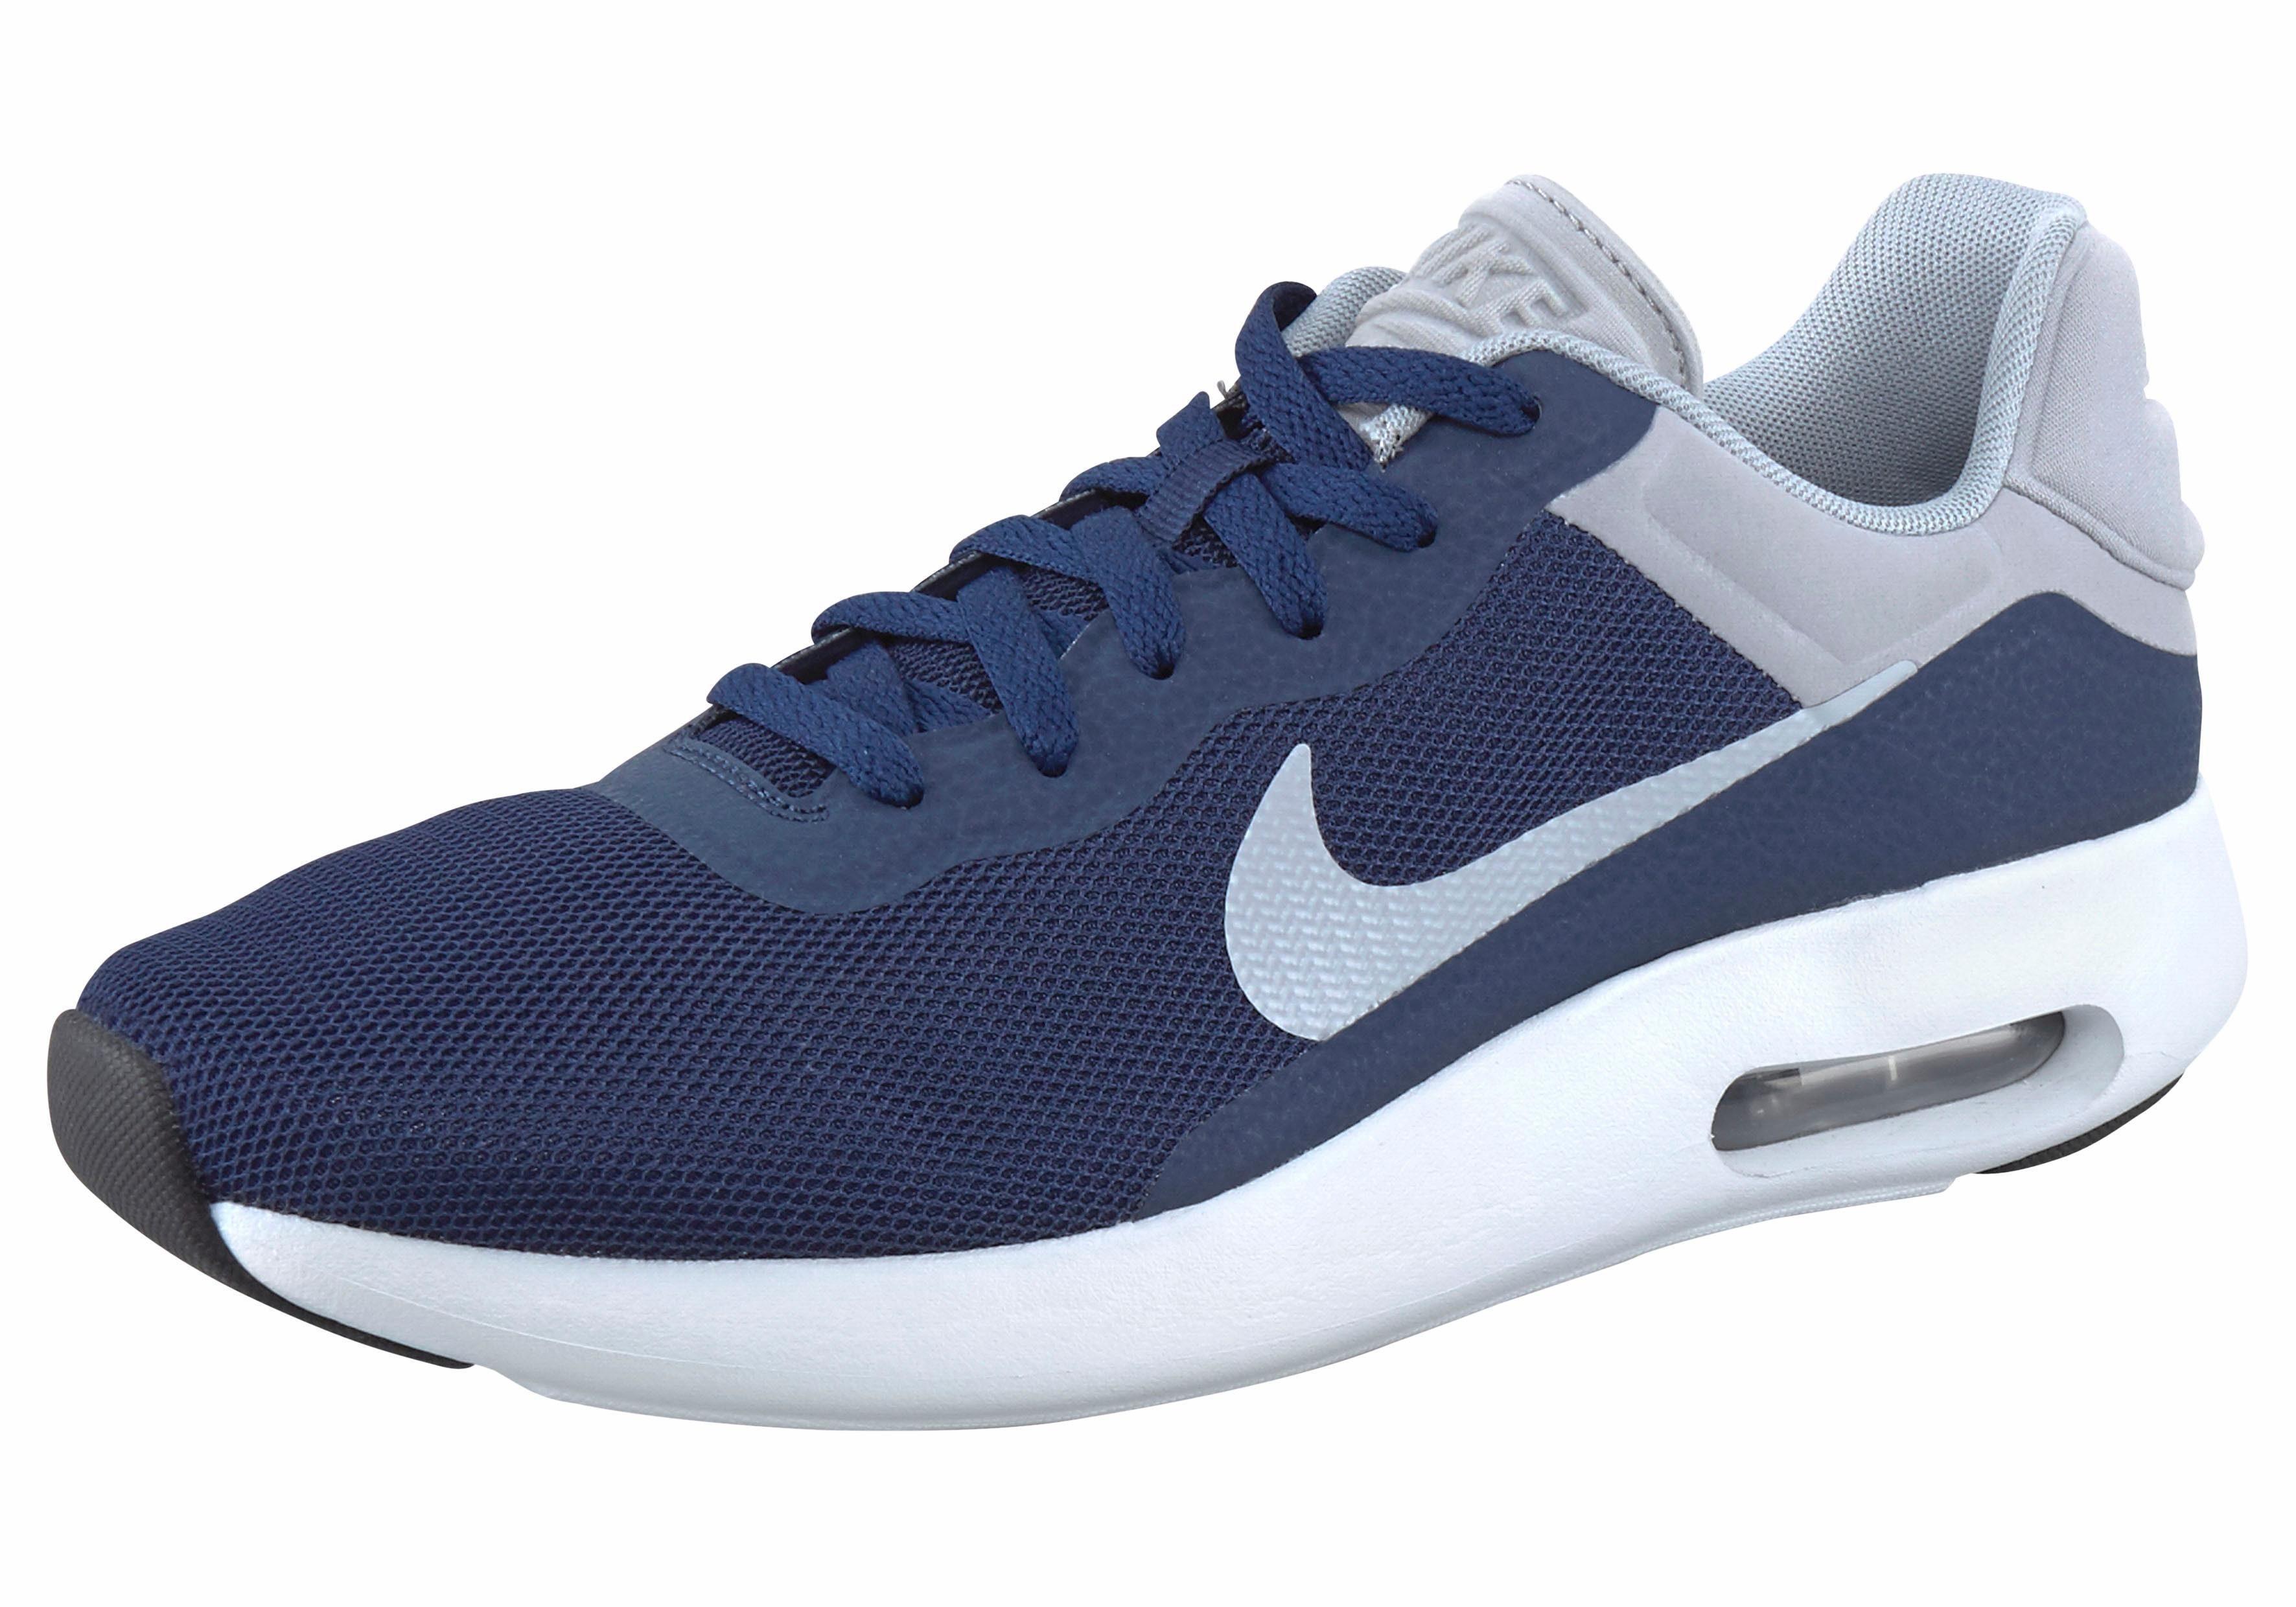 Kaufen Max Herren Air Otto Online Nike gOwIqYn